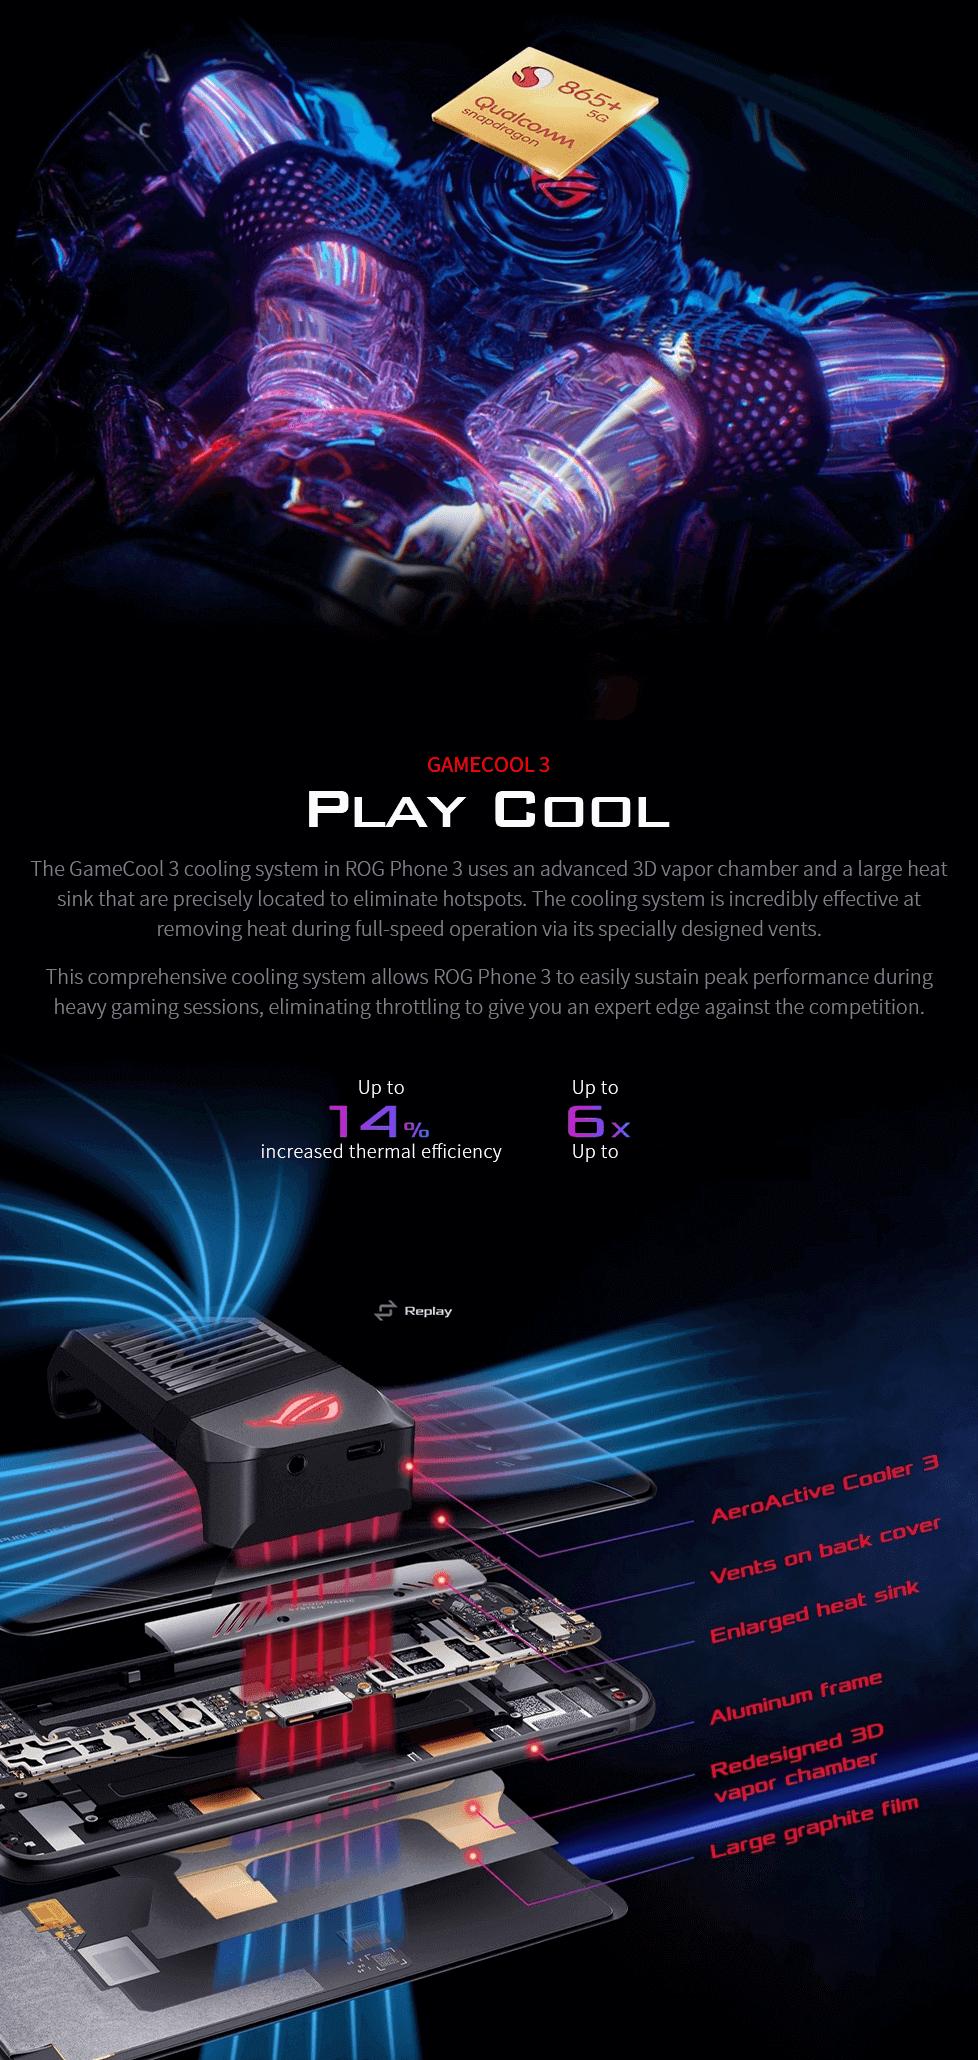 ASUS ROG Phone 3 Gaming 5G Smartphone - Asus Black Friday Deals